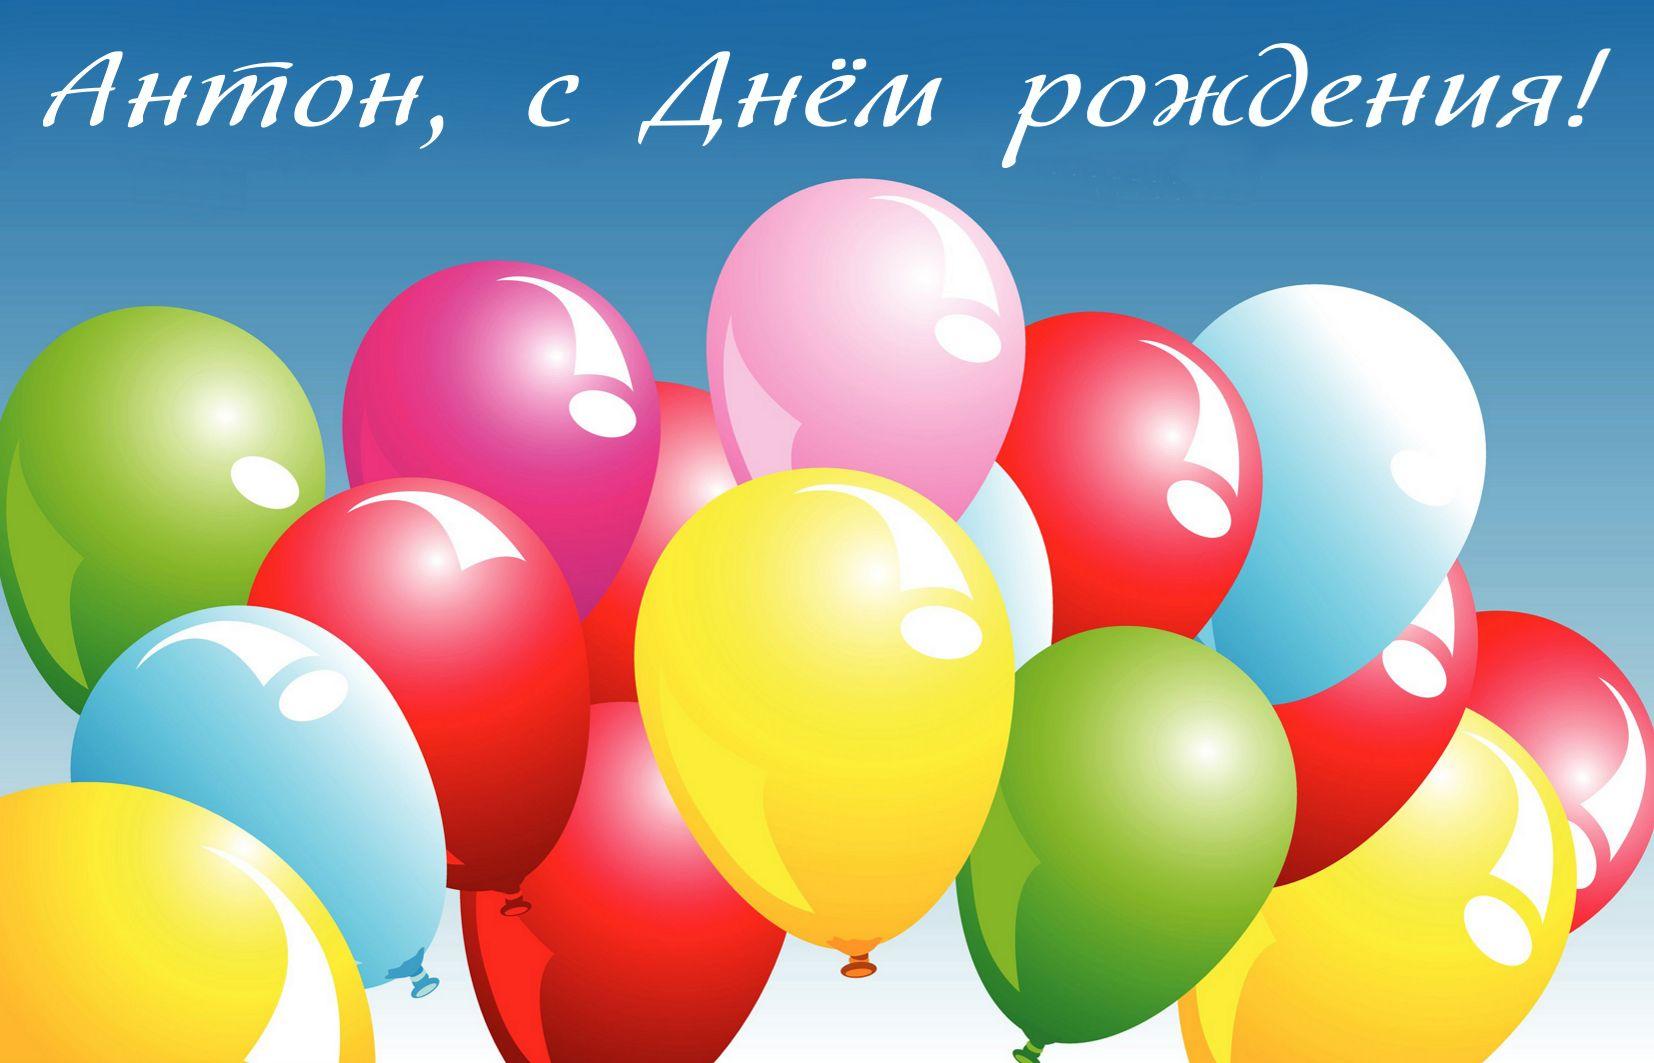 Открытка с днем рождения антон молодому